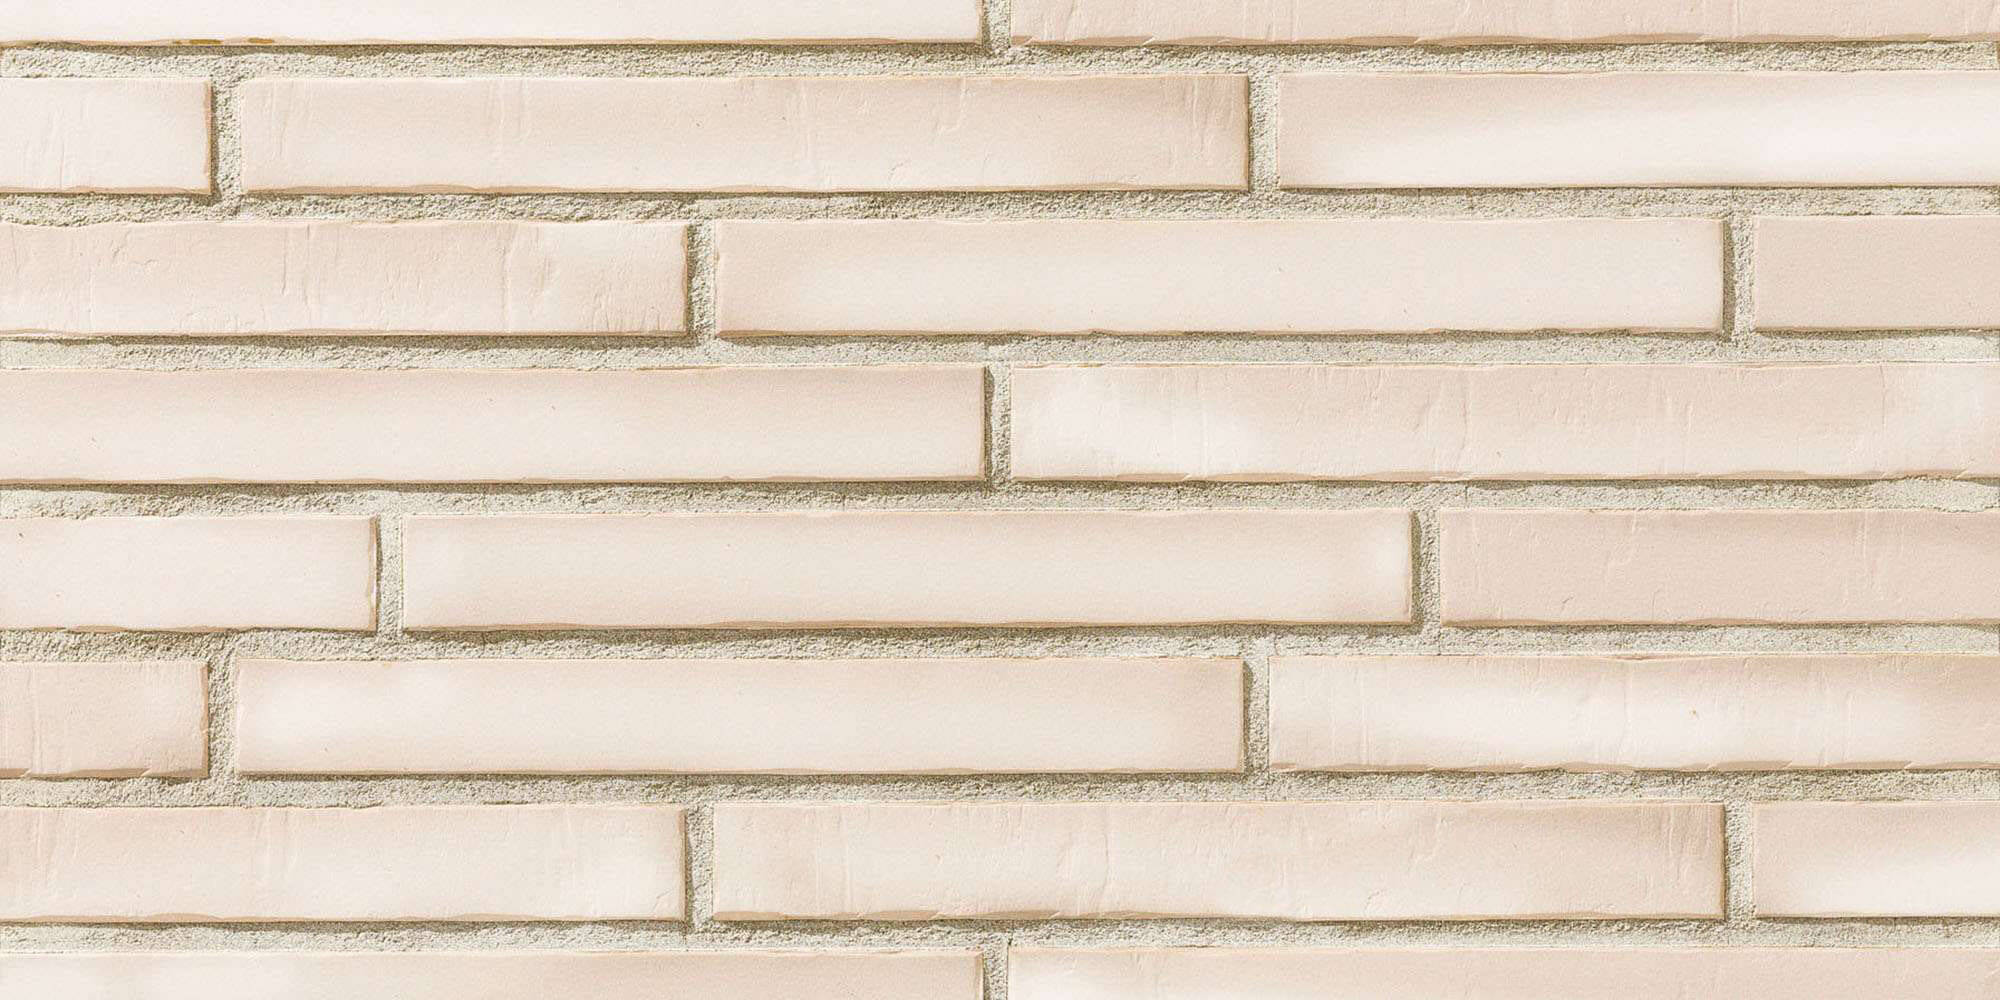 Stroeher, фасадная клинкерная плитка, цвет Glanzstueck №4, серия Glanzstueck, узкая, 440x52x14